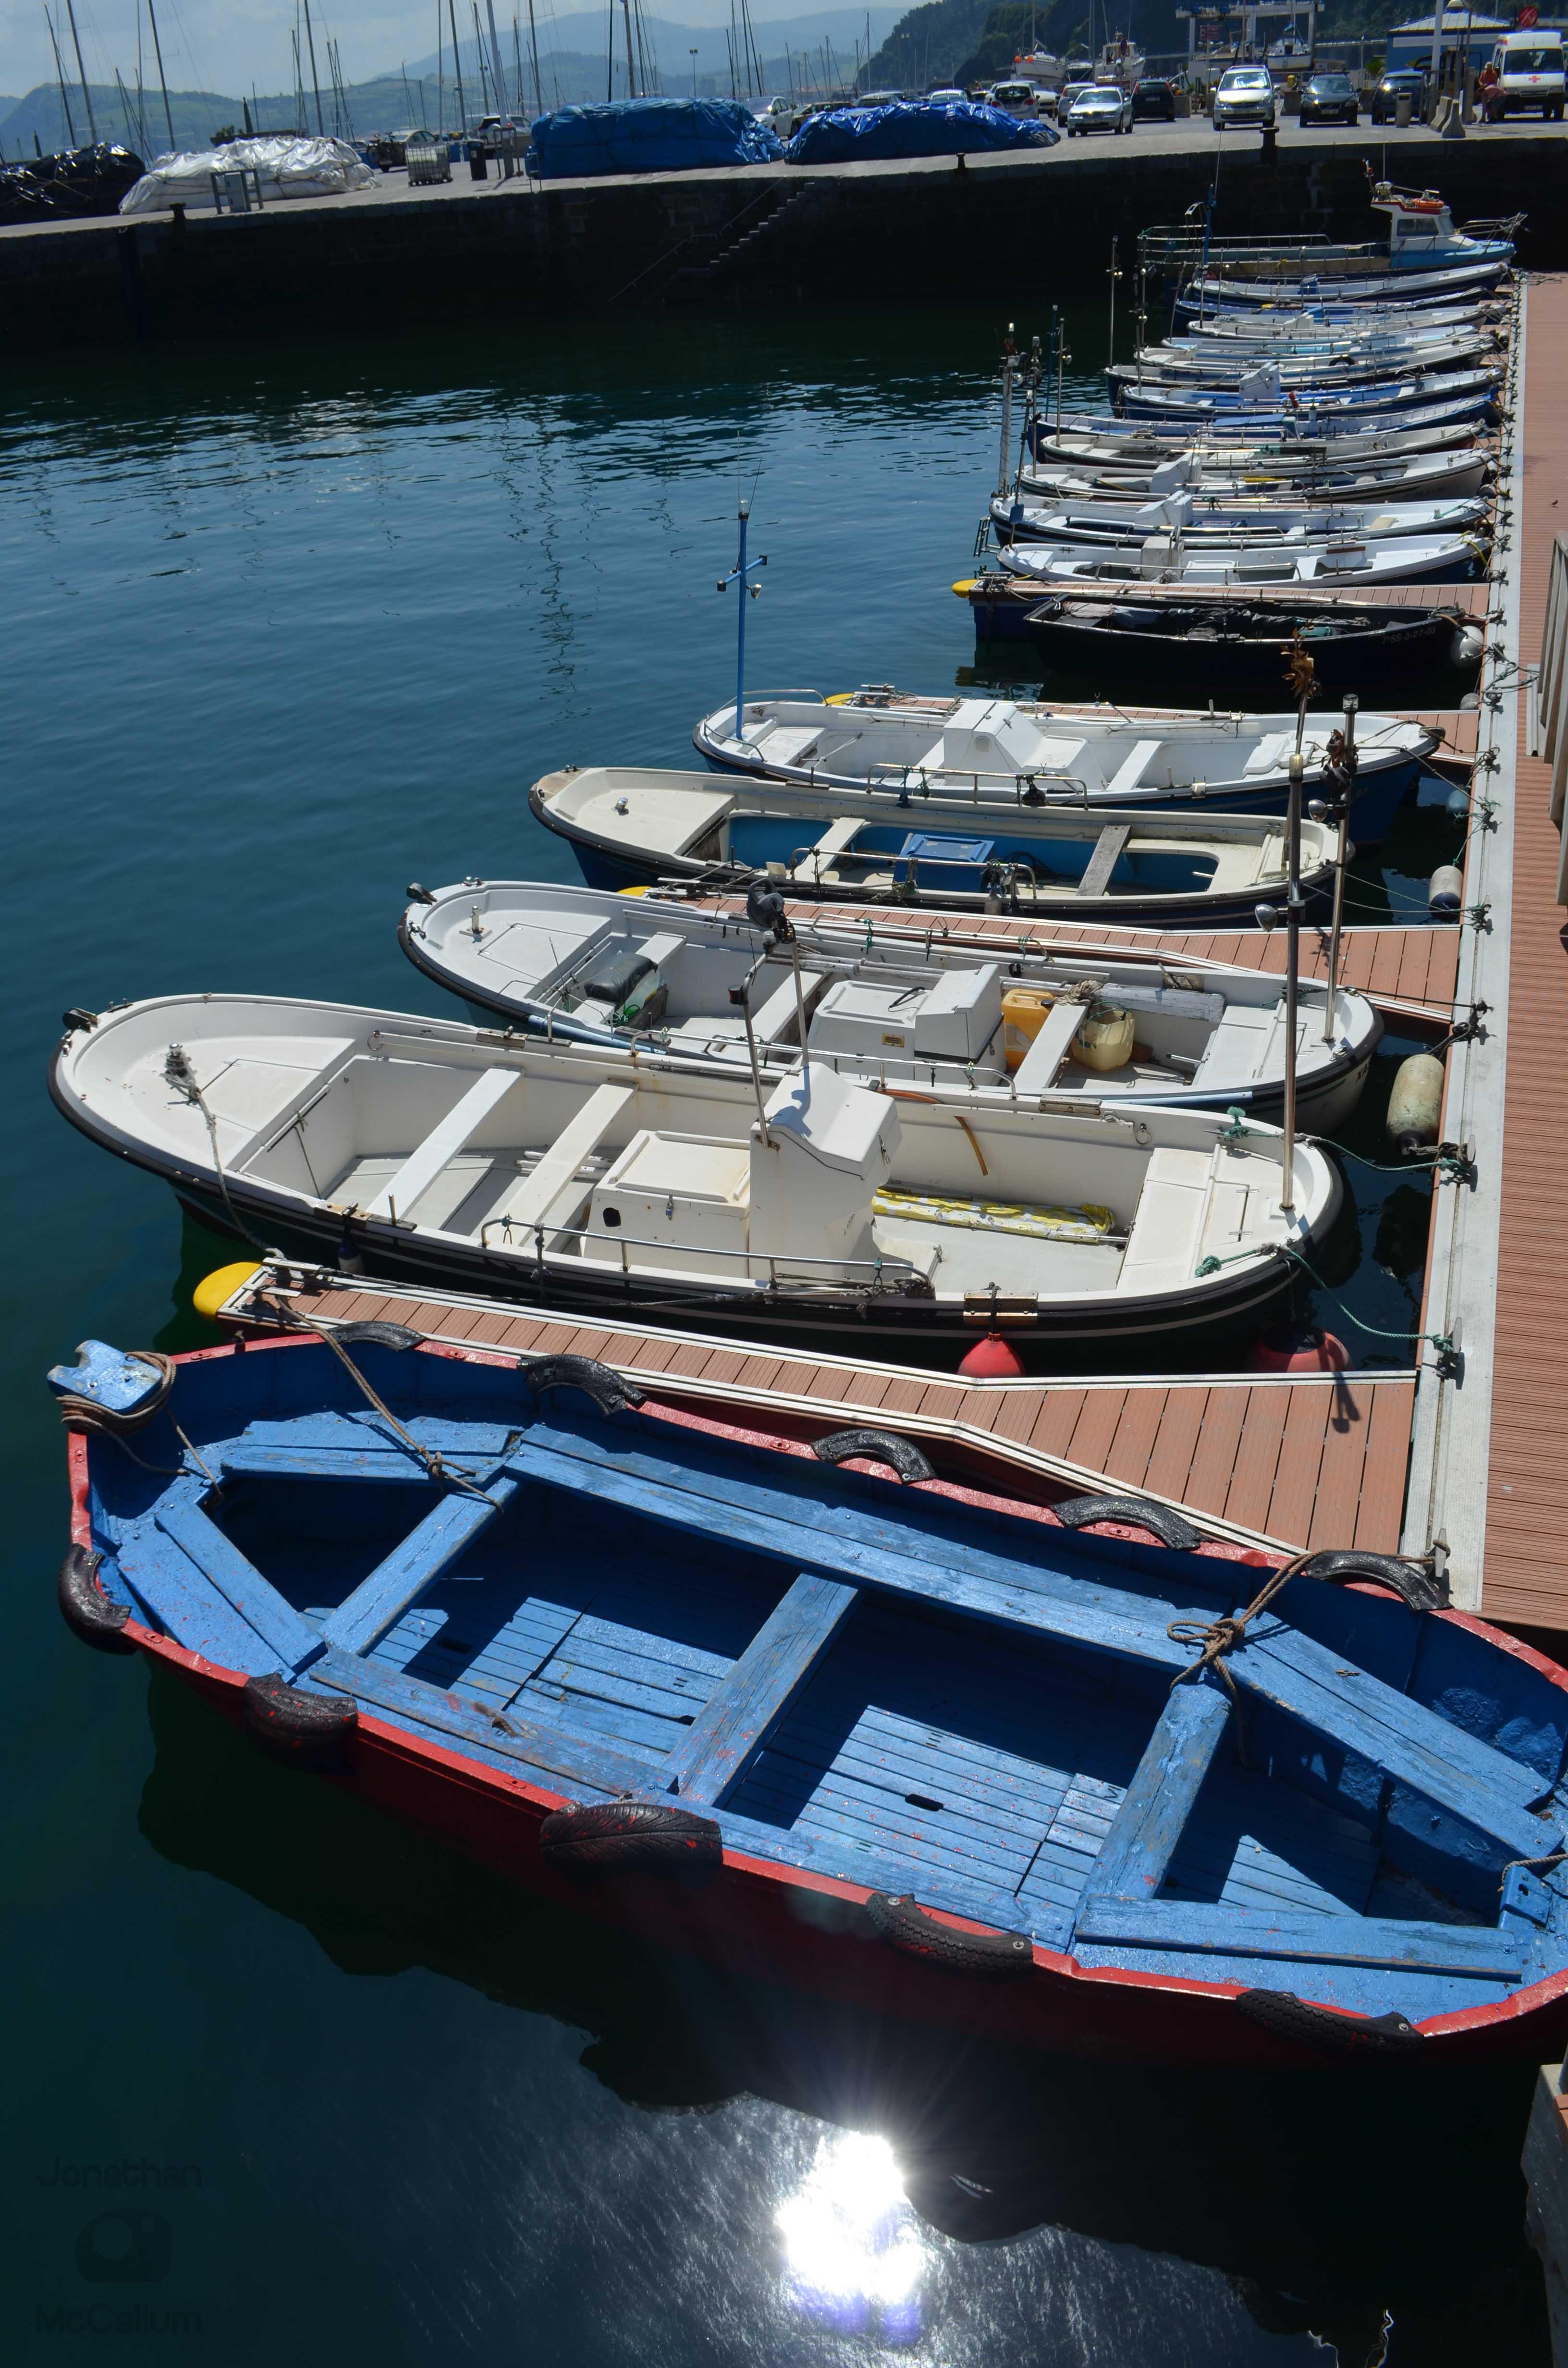 Getaria: A Taste and Sea